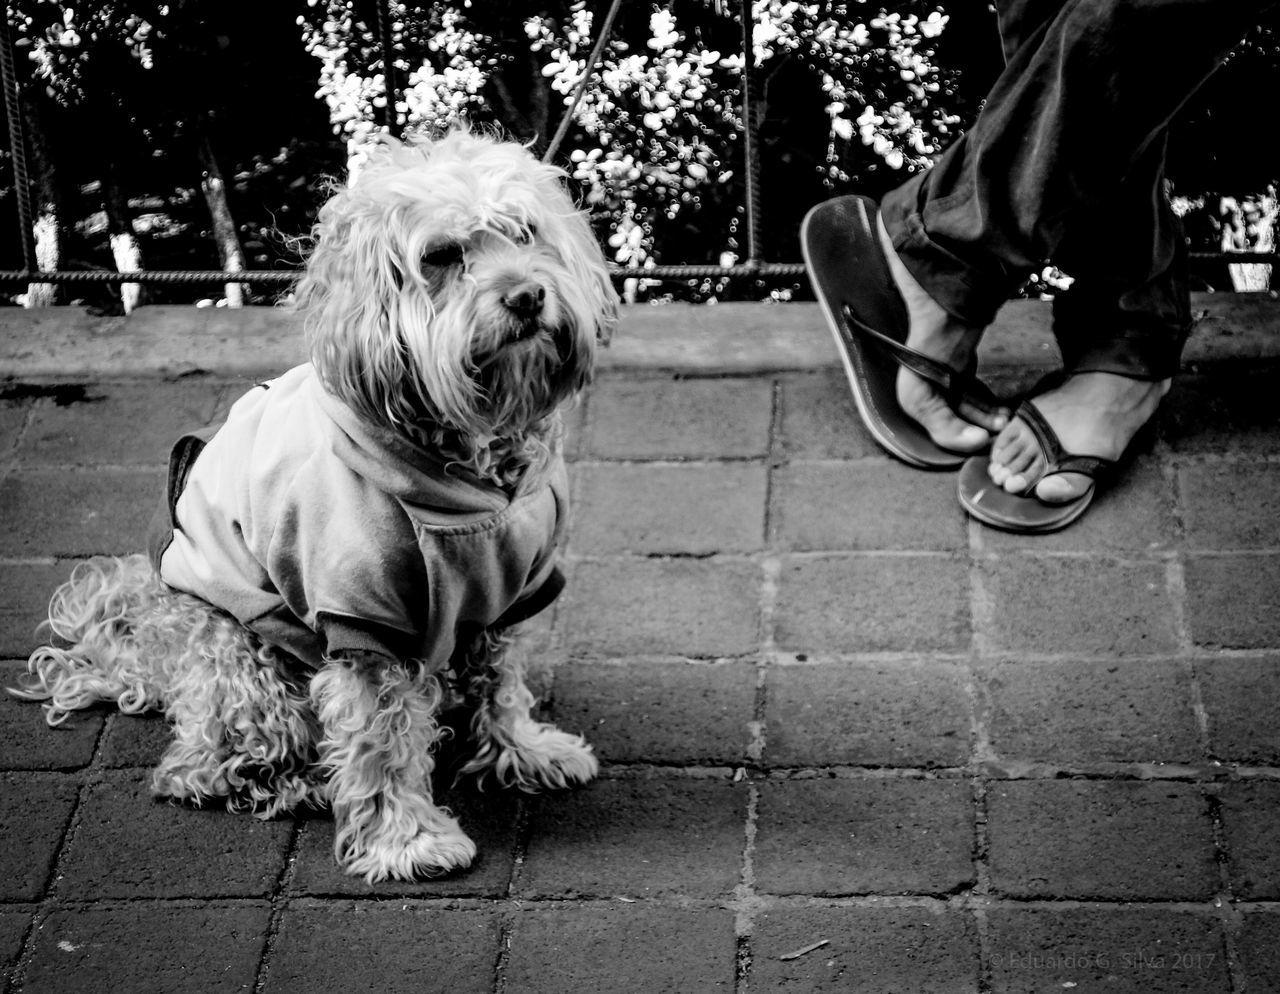 Black & White Dog Pets Domestic Animals Animal Themes Black And White Collection  Black And White Black And White Photography Urbanphotography Street Photography Streetphotography Mexico City